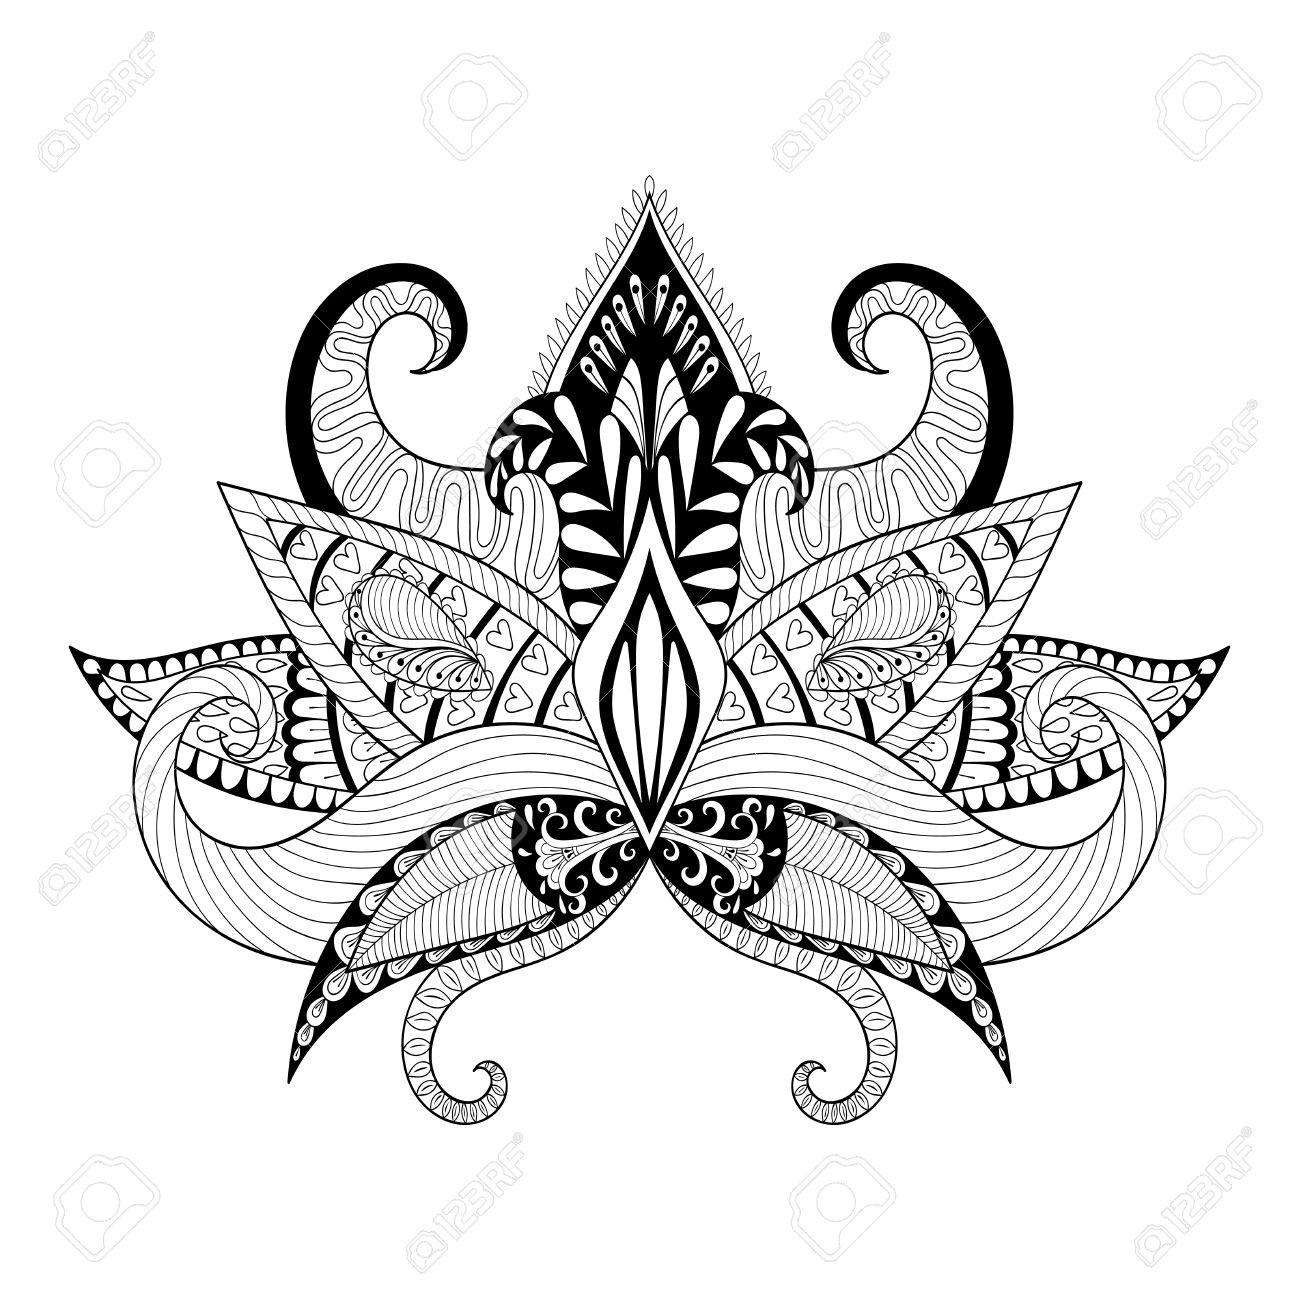 Boho ornamental lotus flower blackwork tattoo design indian boho ornamental lotus flower blackwork tattoo design indian paisley hand drawn vector illustration izmirmasajfo